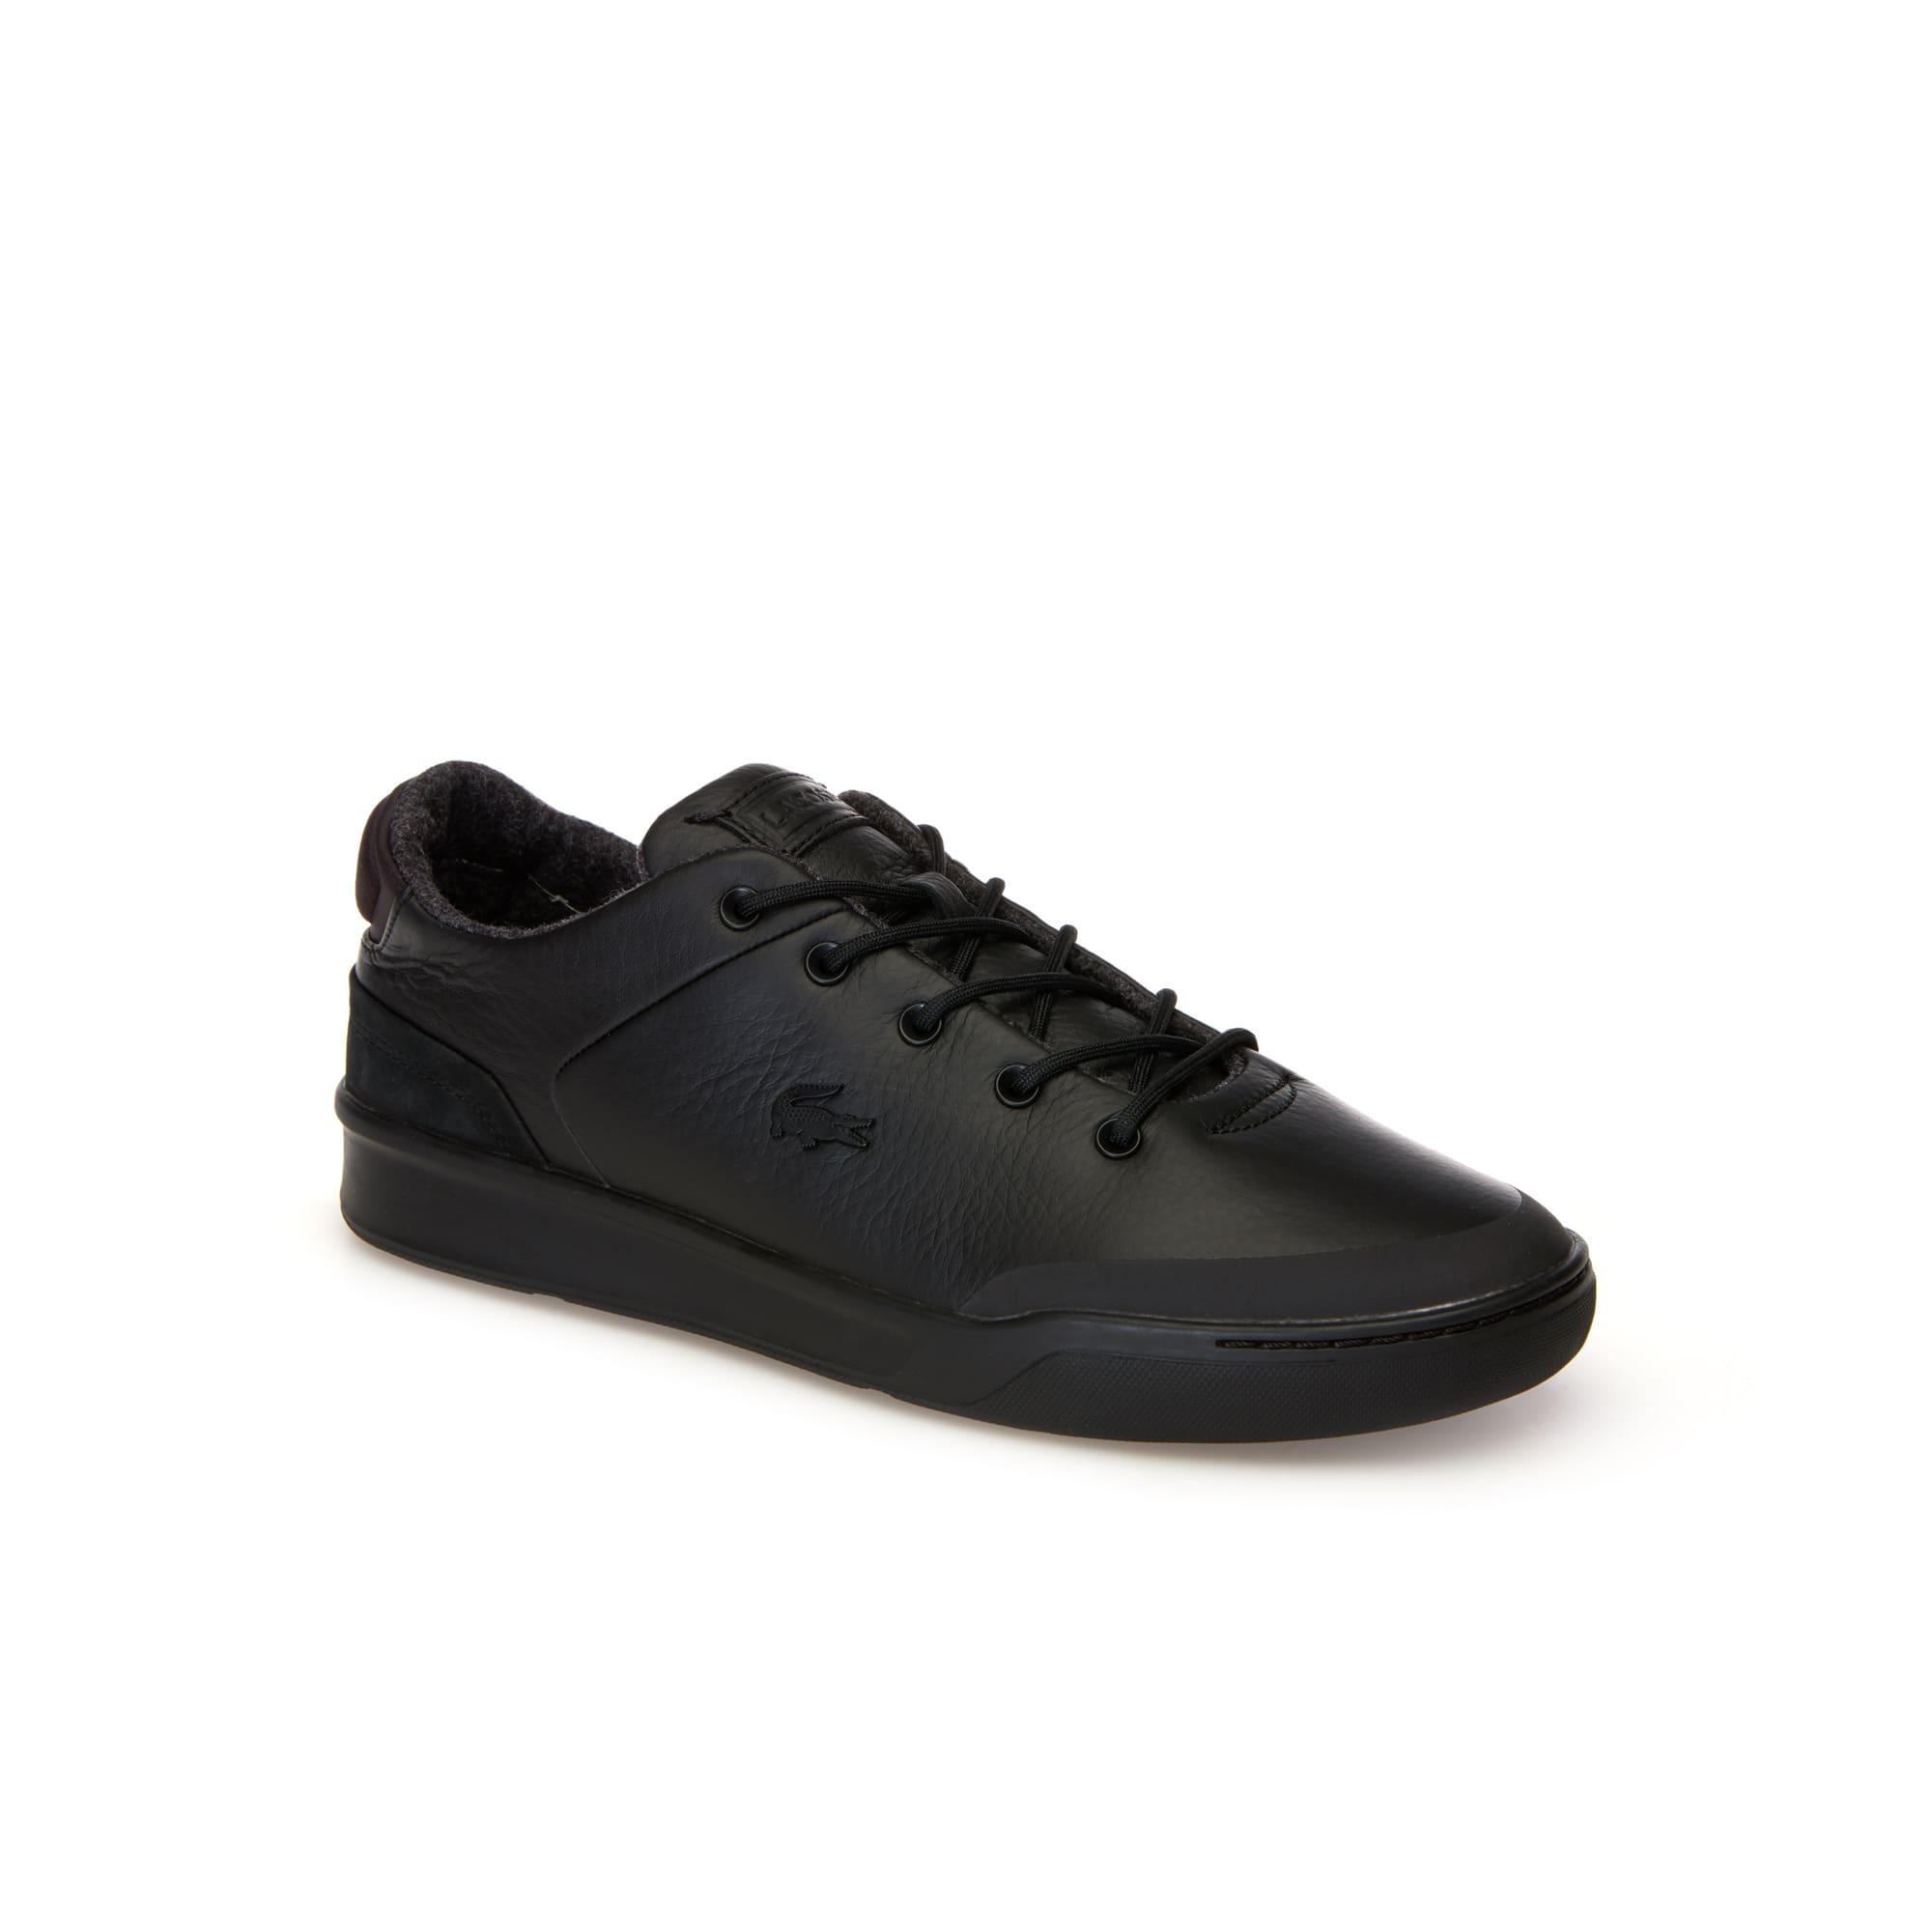 Sneakers Explorateur Classic L homme en cuir Nappa